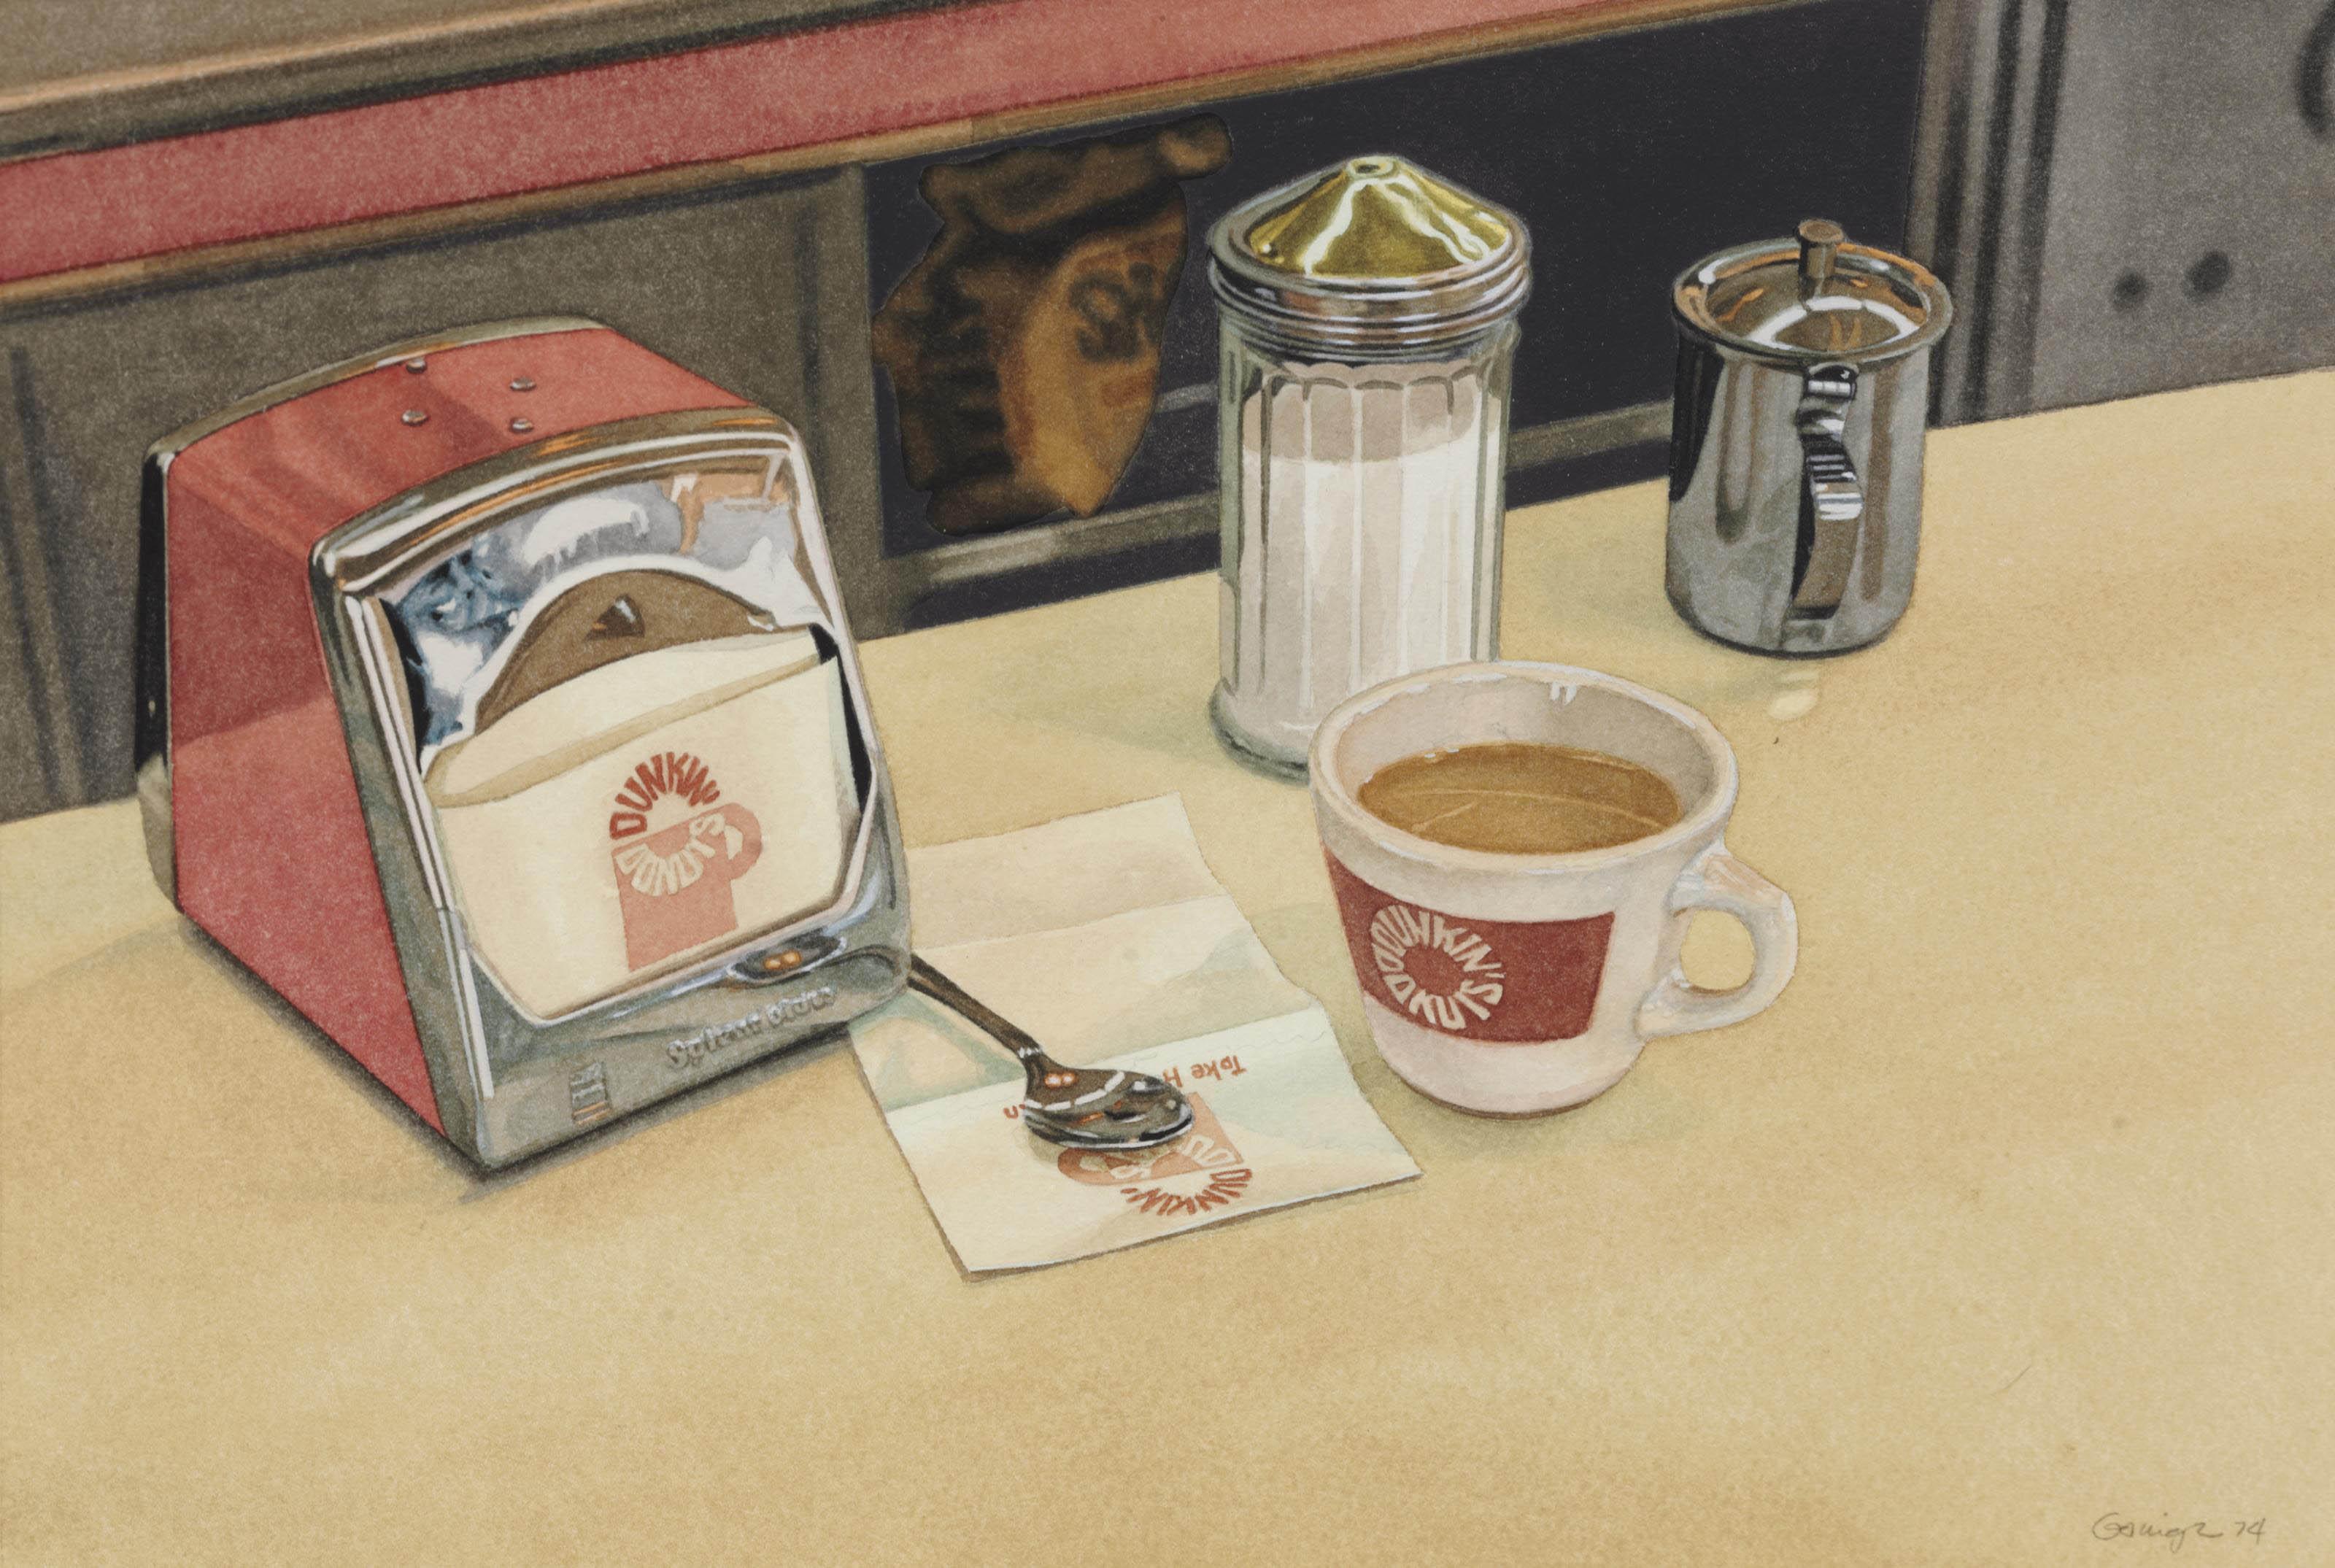 Dunkin' Donuts Coffee Shop